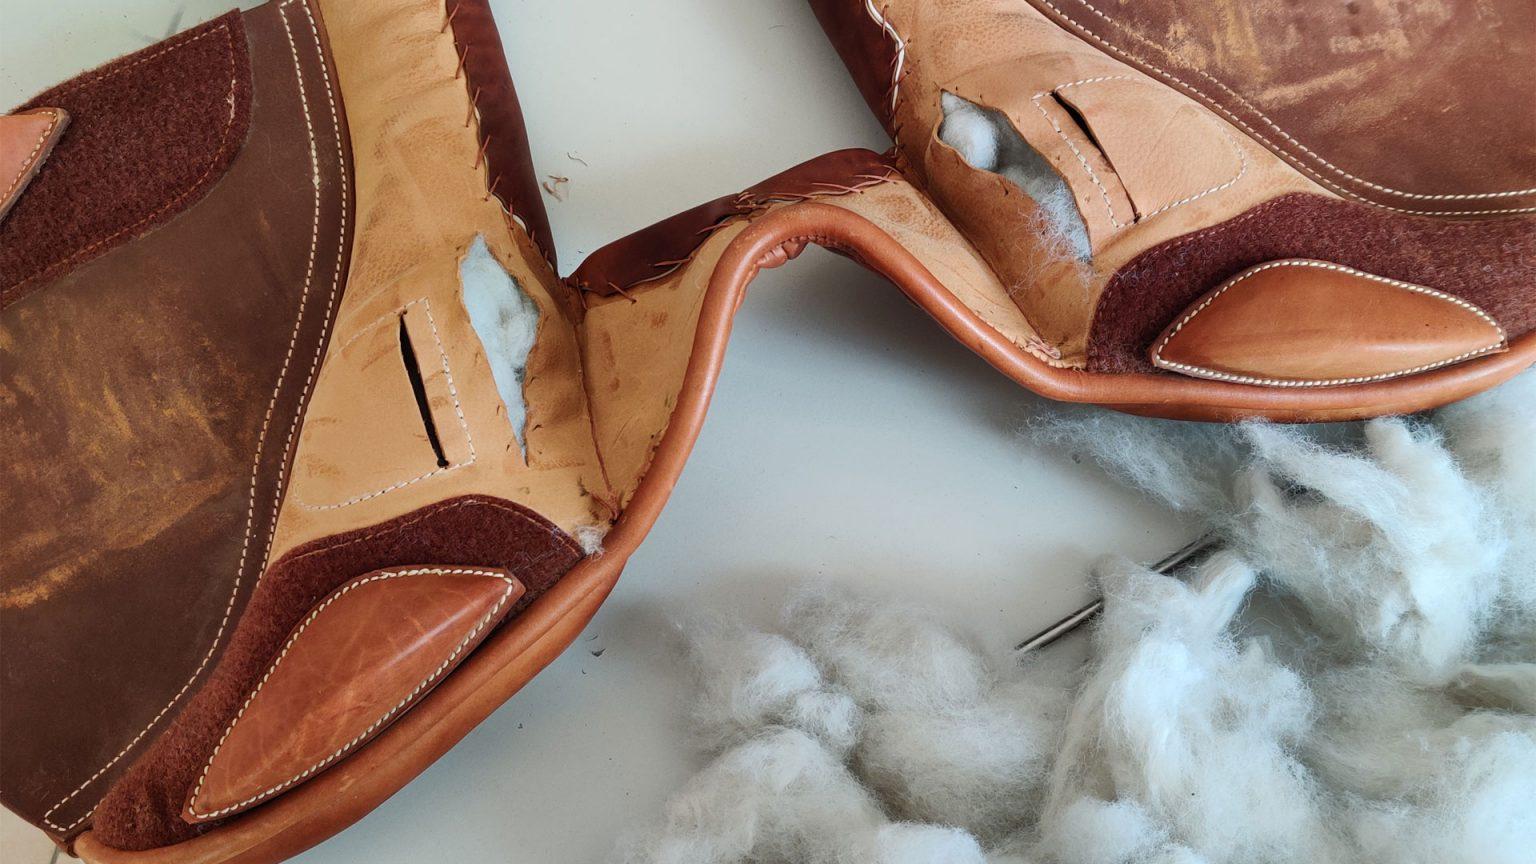 riparazione selle reimbottitura cuscini